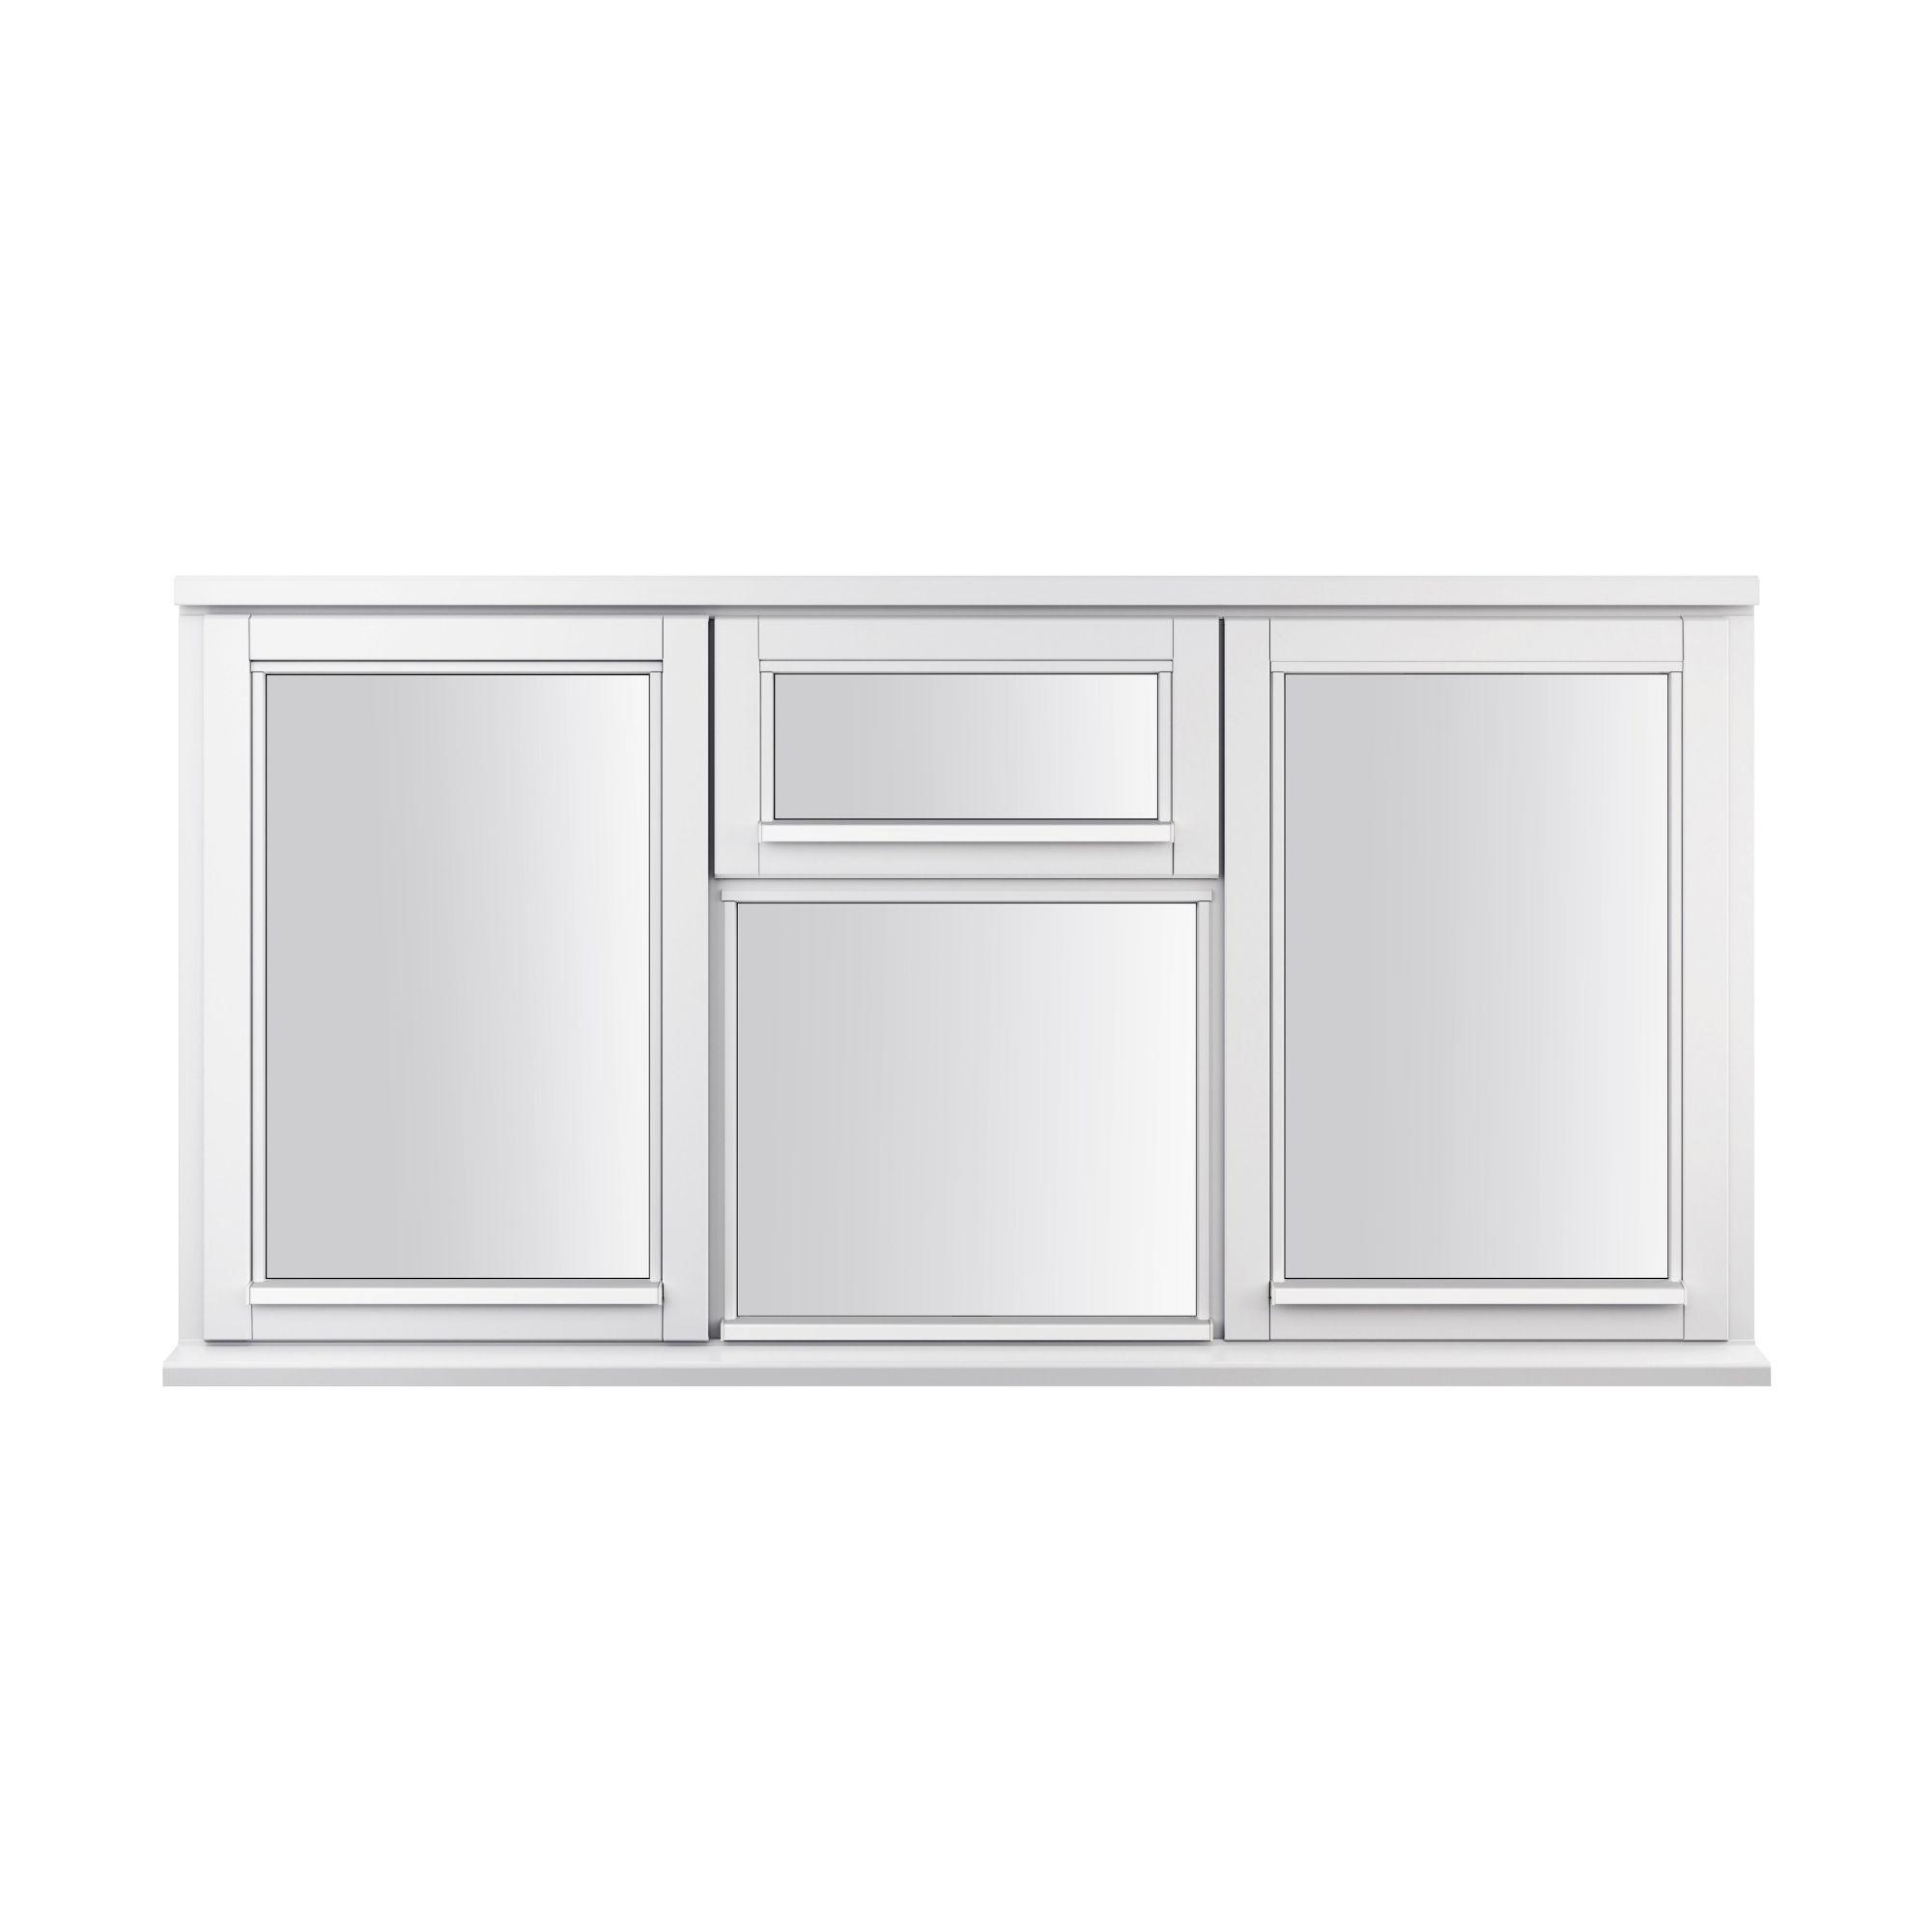 Double Glazed Windows Diy : Double glazed timber two side hung casement window h